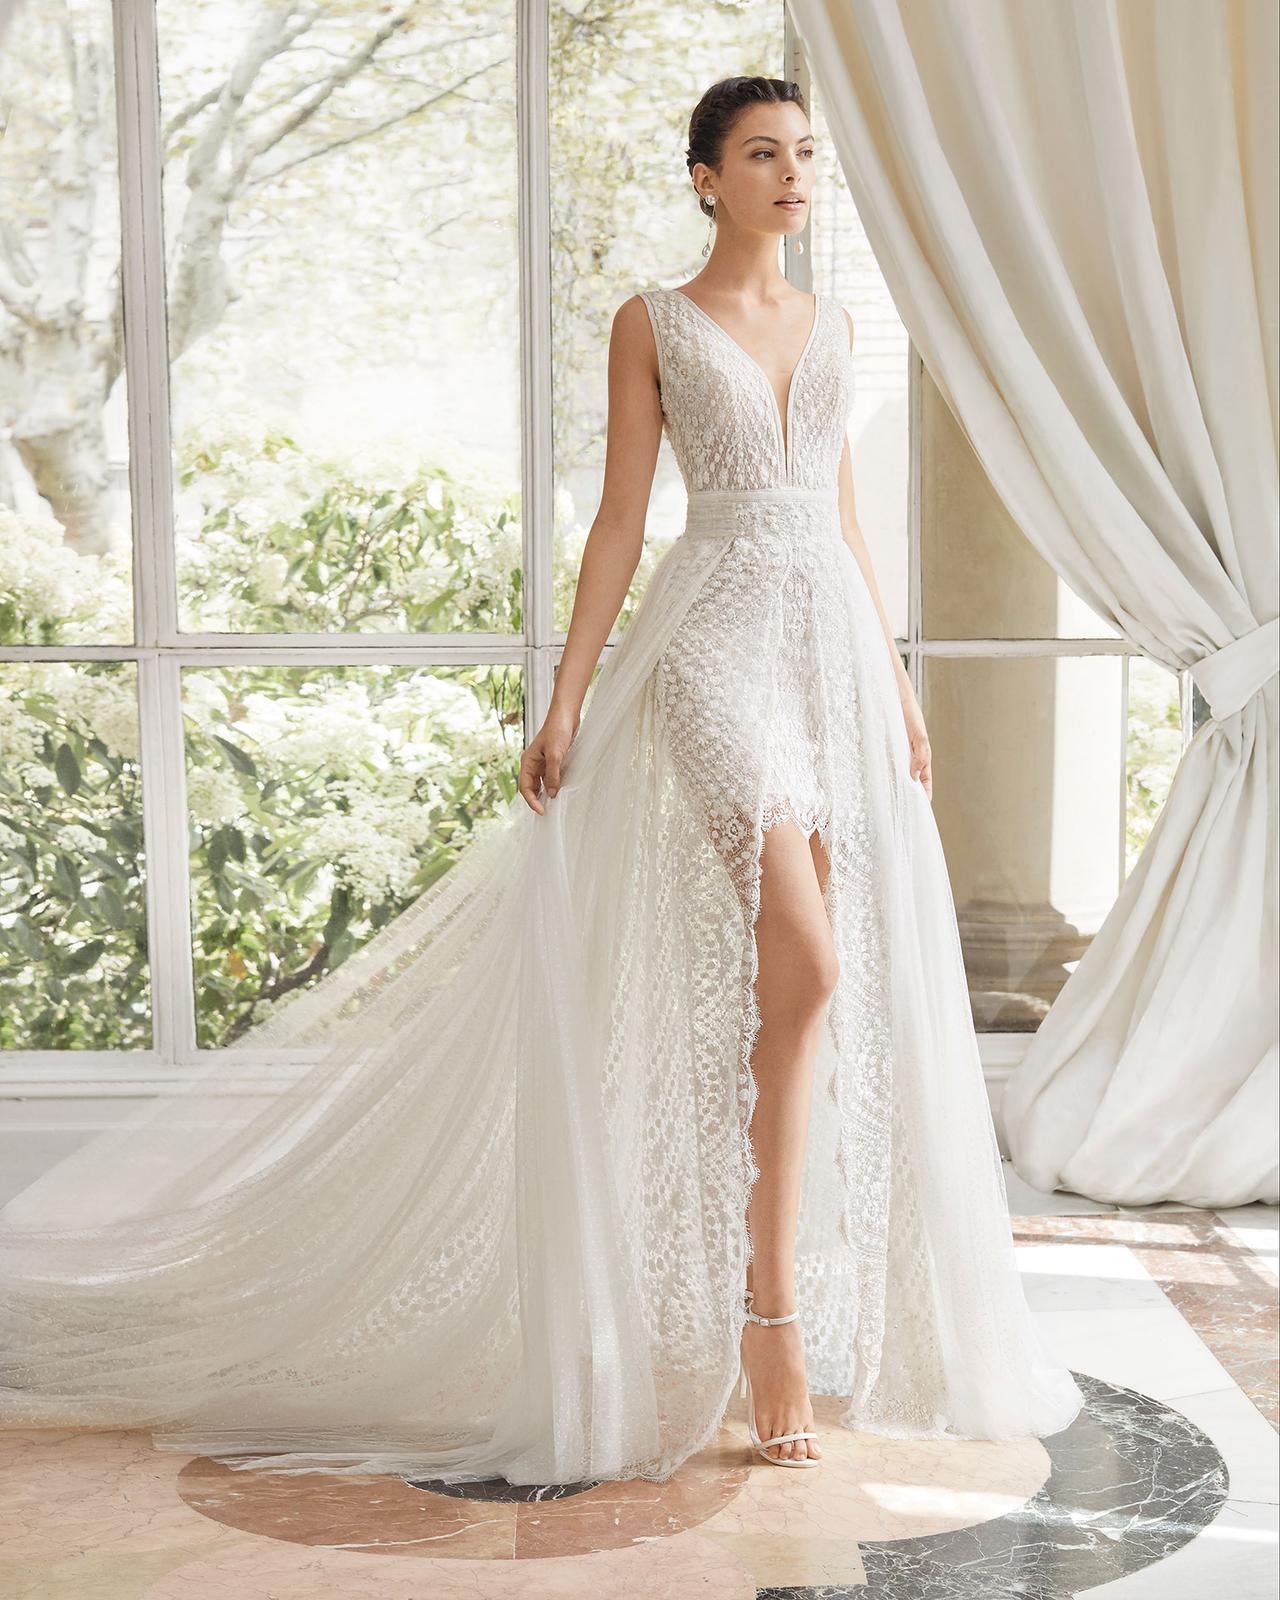 Rosa Clará Couture 2019 - Melanie